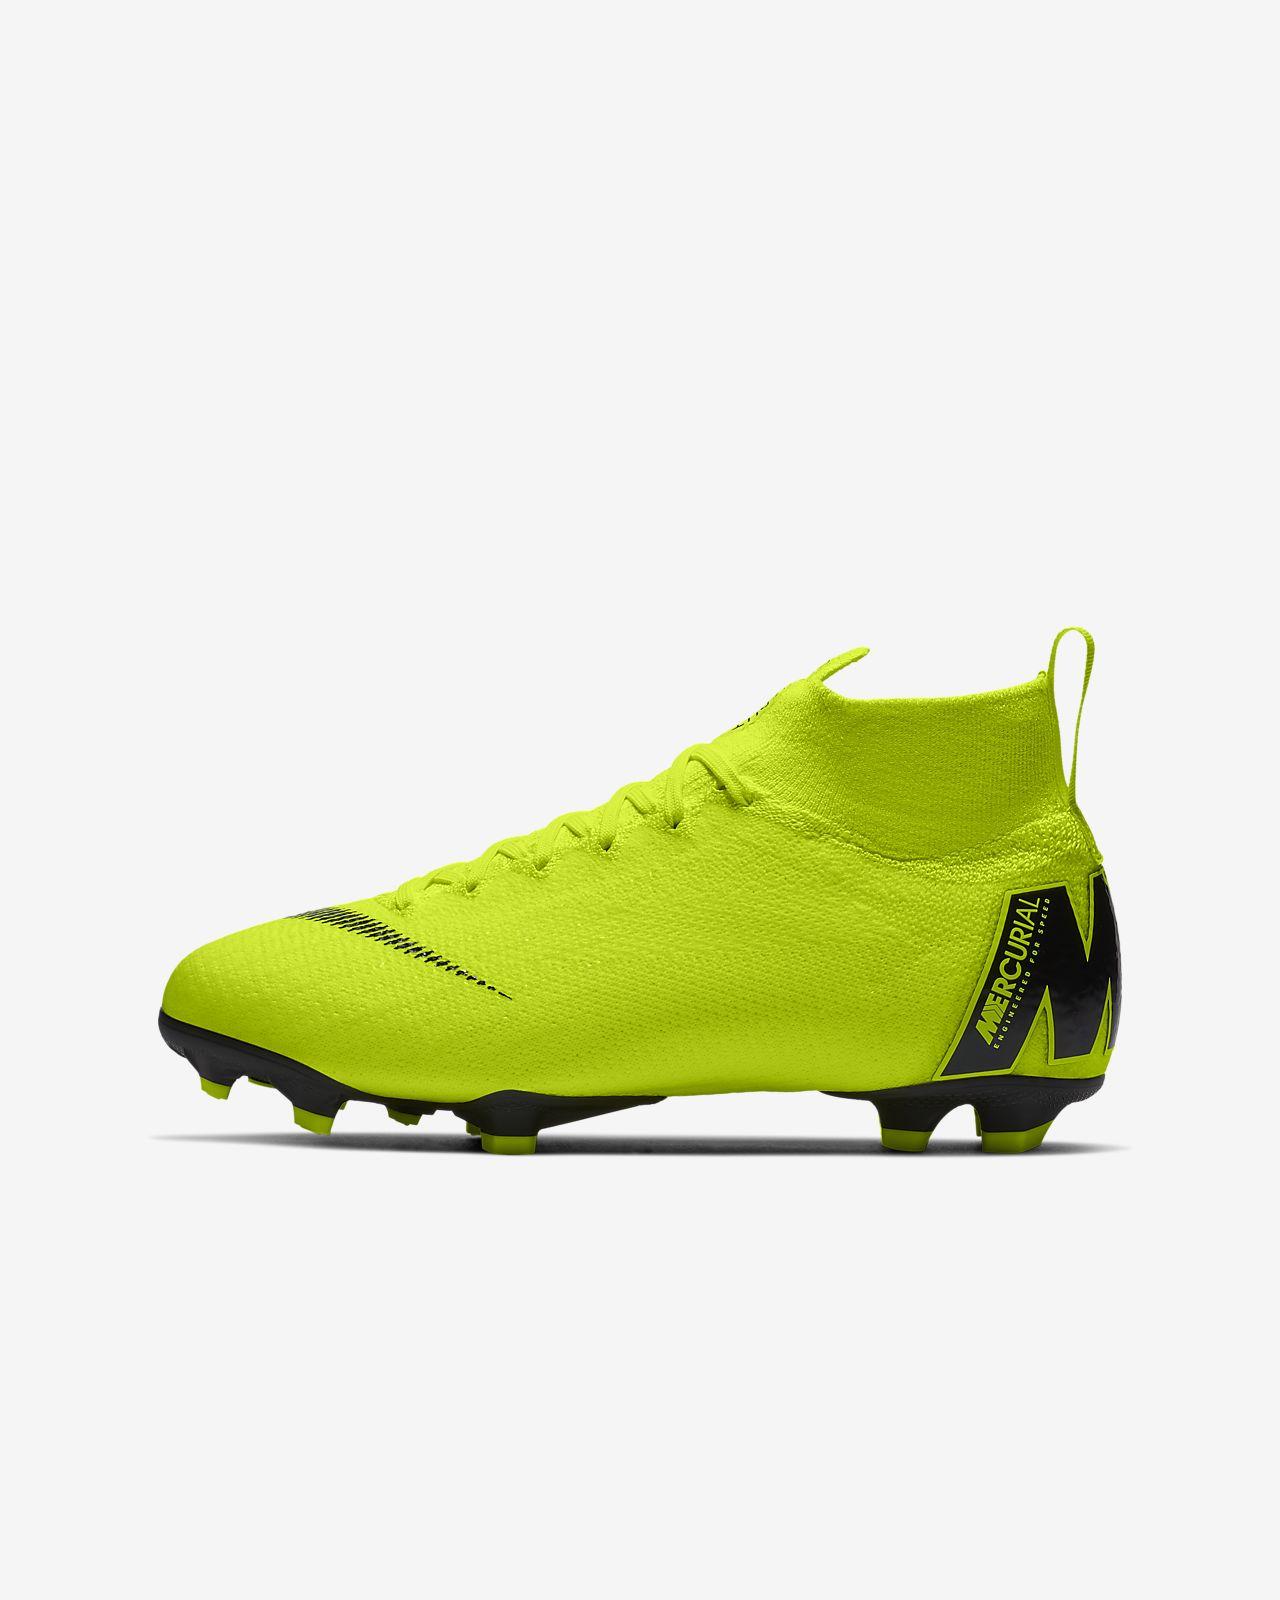 ... Scarpa da calcio per terreni duri Nike Jr. Superfly 6 Elite FG - Ragazzi 1616bfc7883